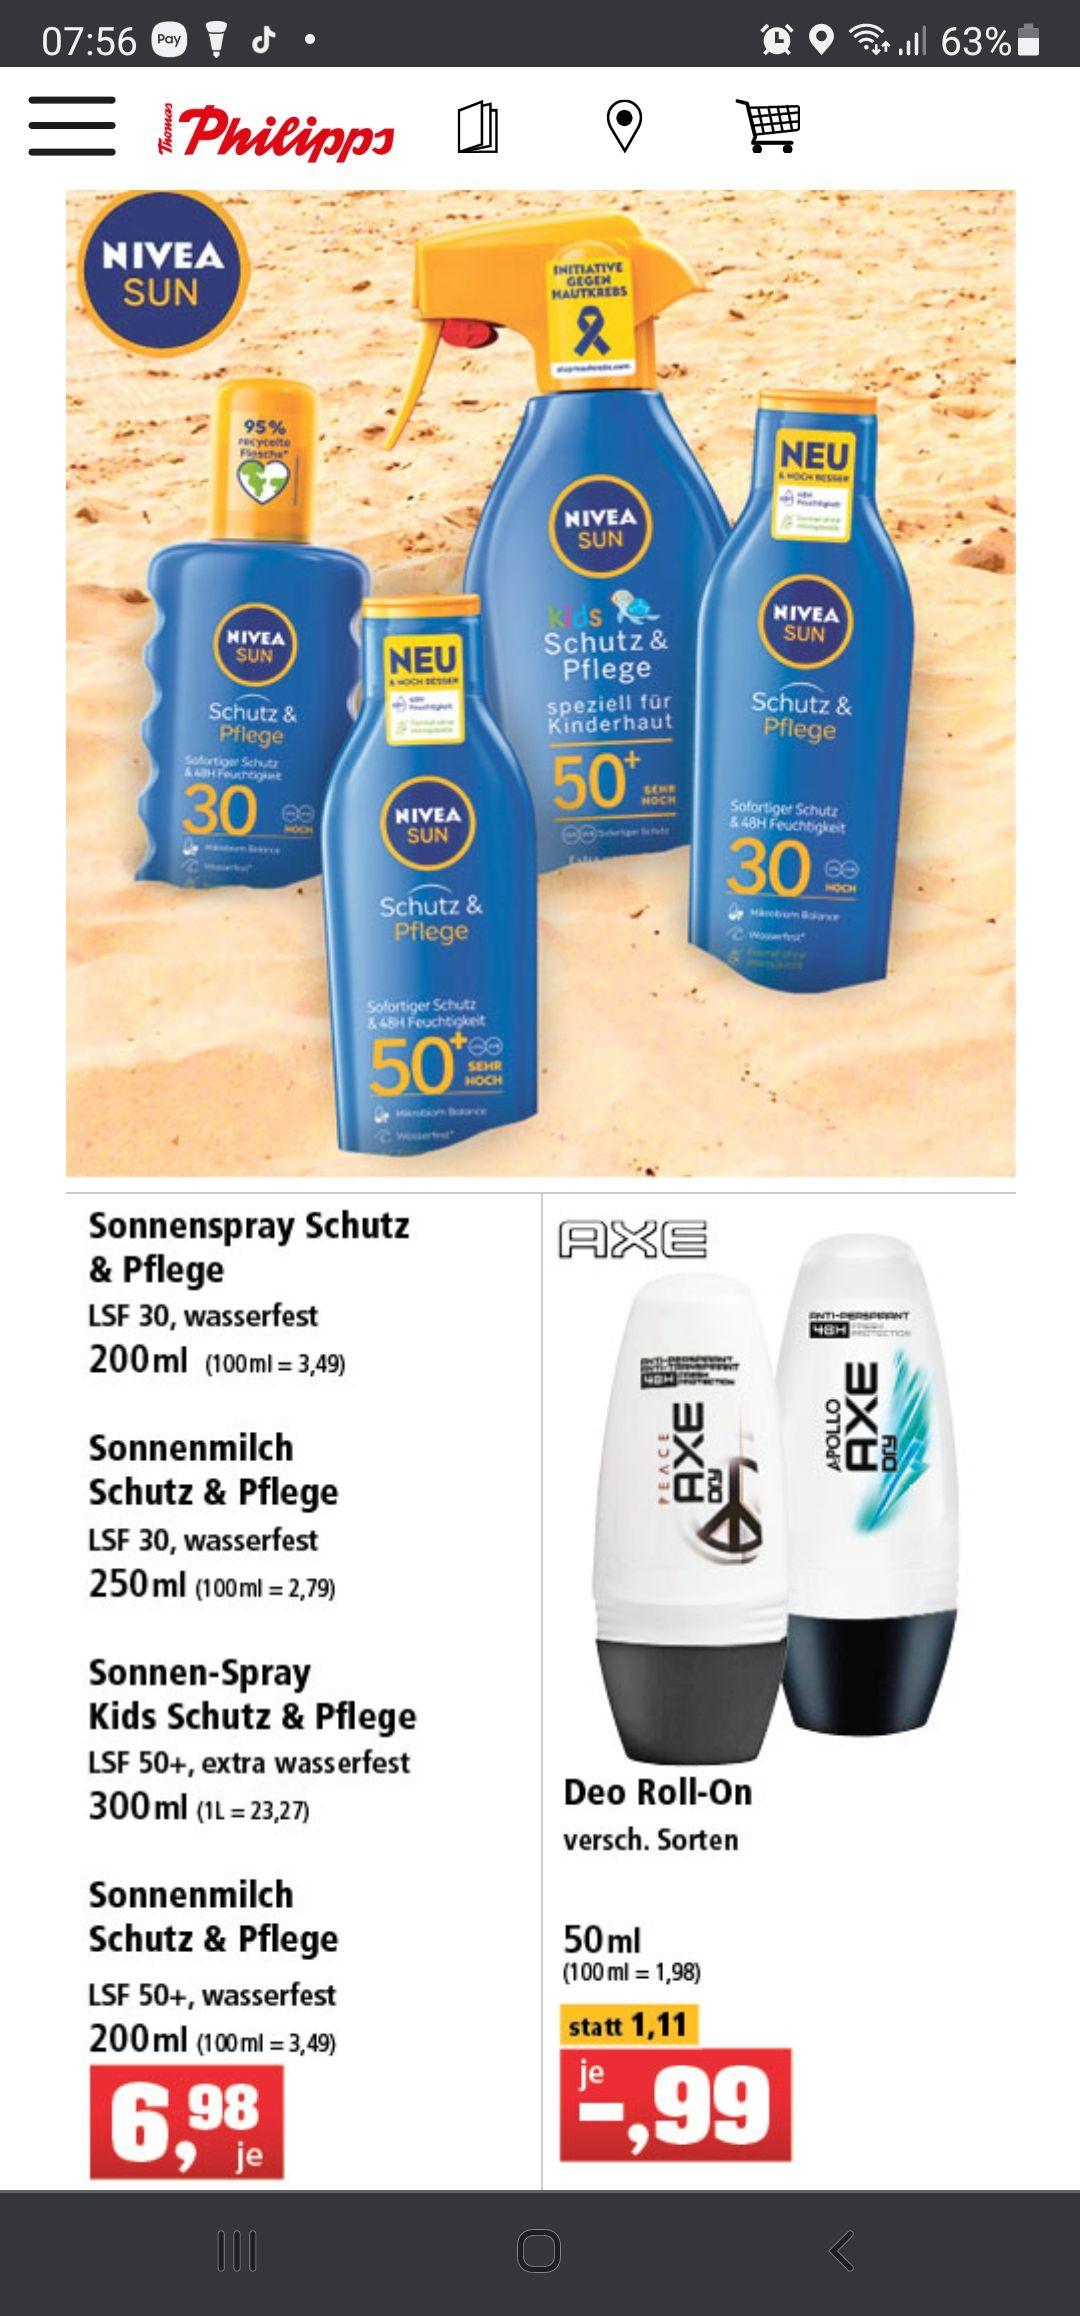 Thomas Phillips: NIVEA SUN Kids Schutz & Pflege Sonnenspray LFS 50+